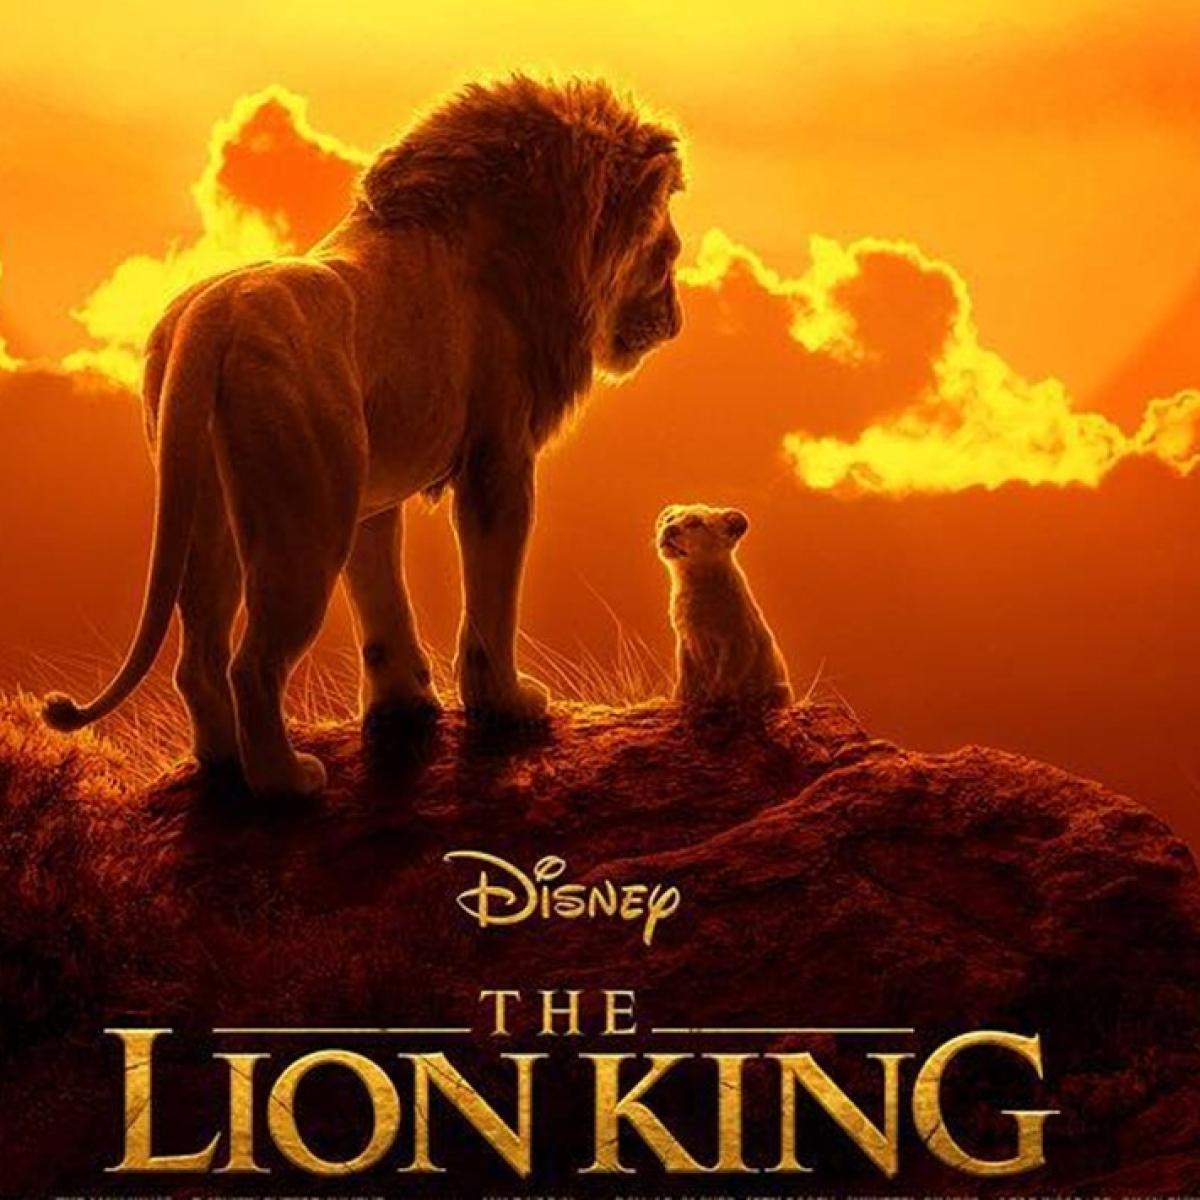 Sanjay Mishra, Shreyas Talpade, Ashish Vidyarthi, Asrani join cast of 'The Lion King'